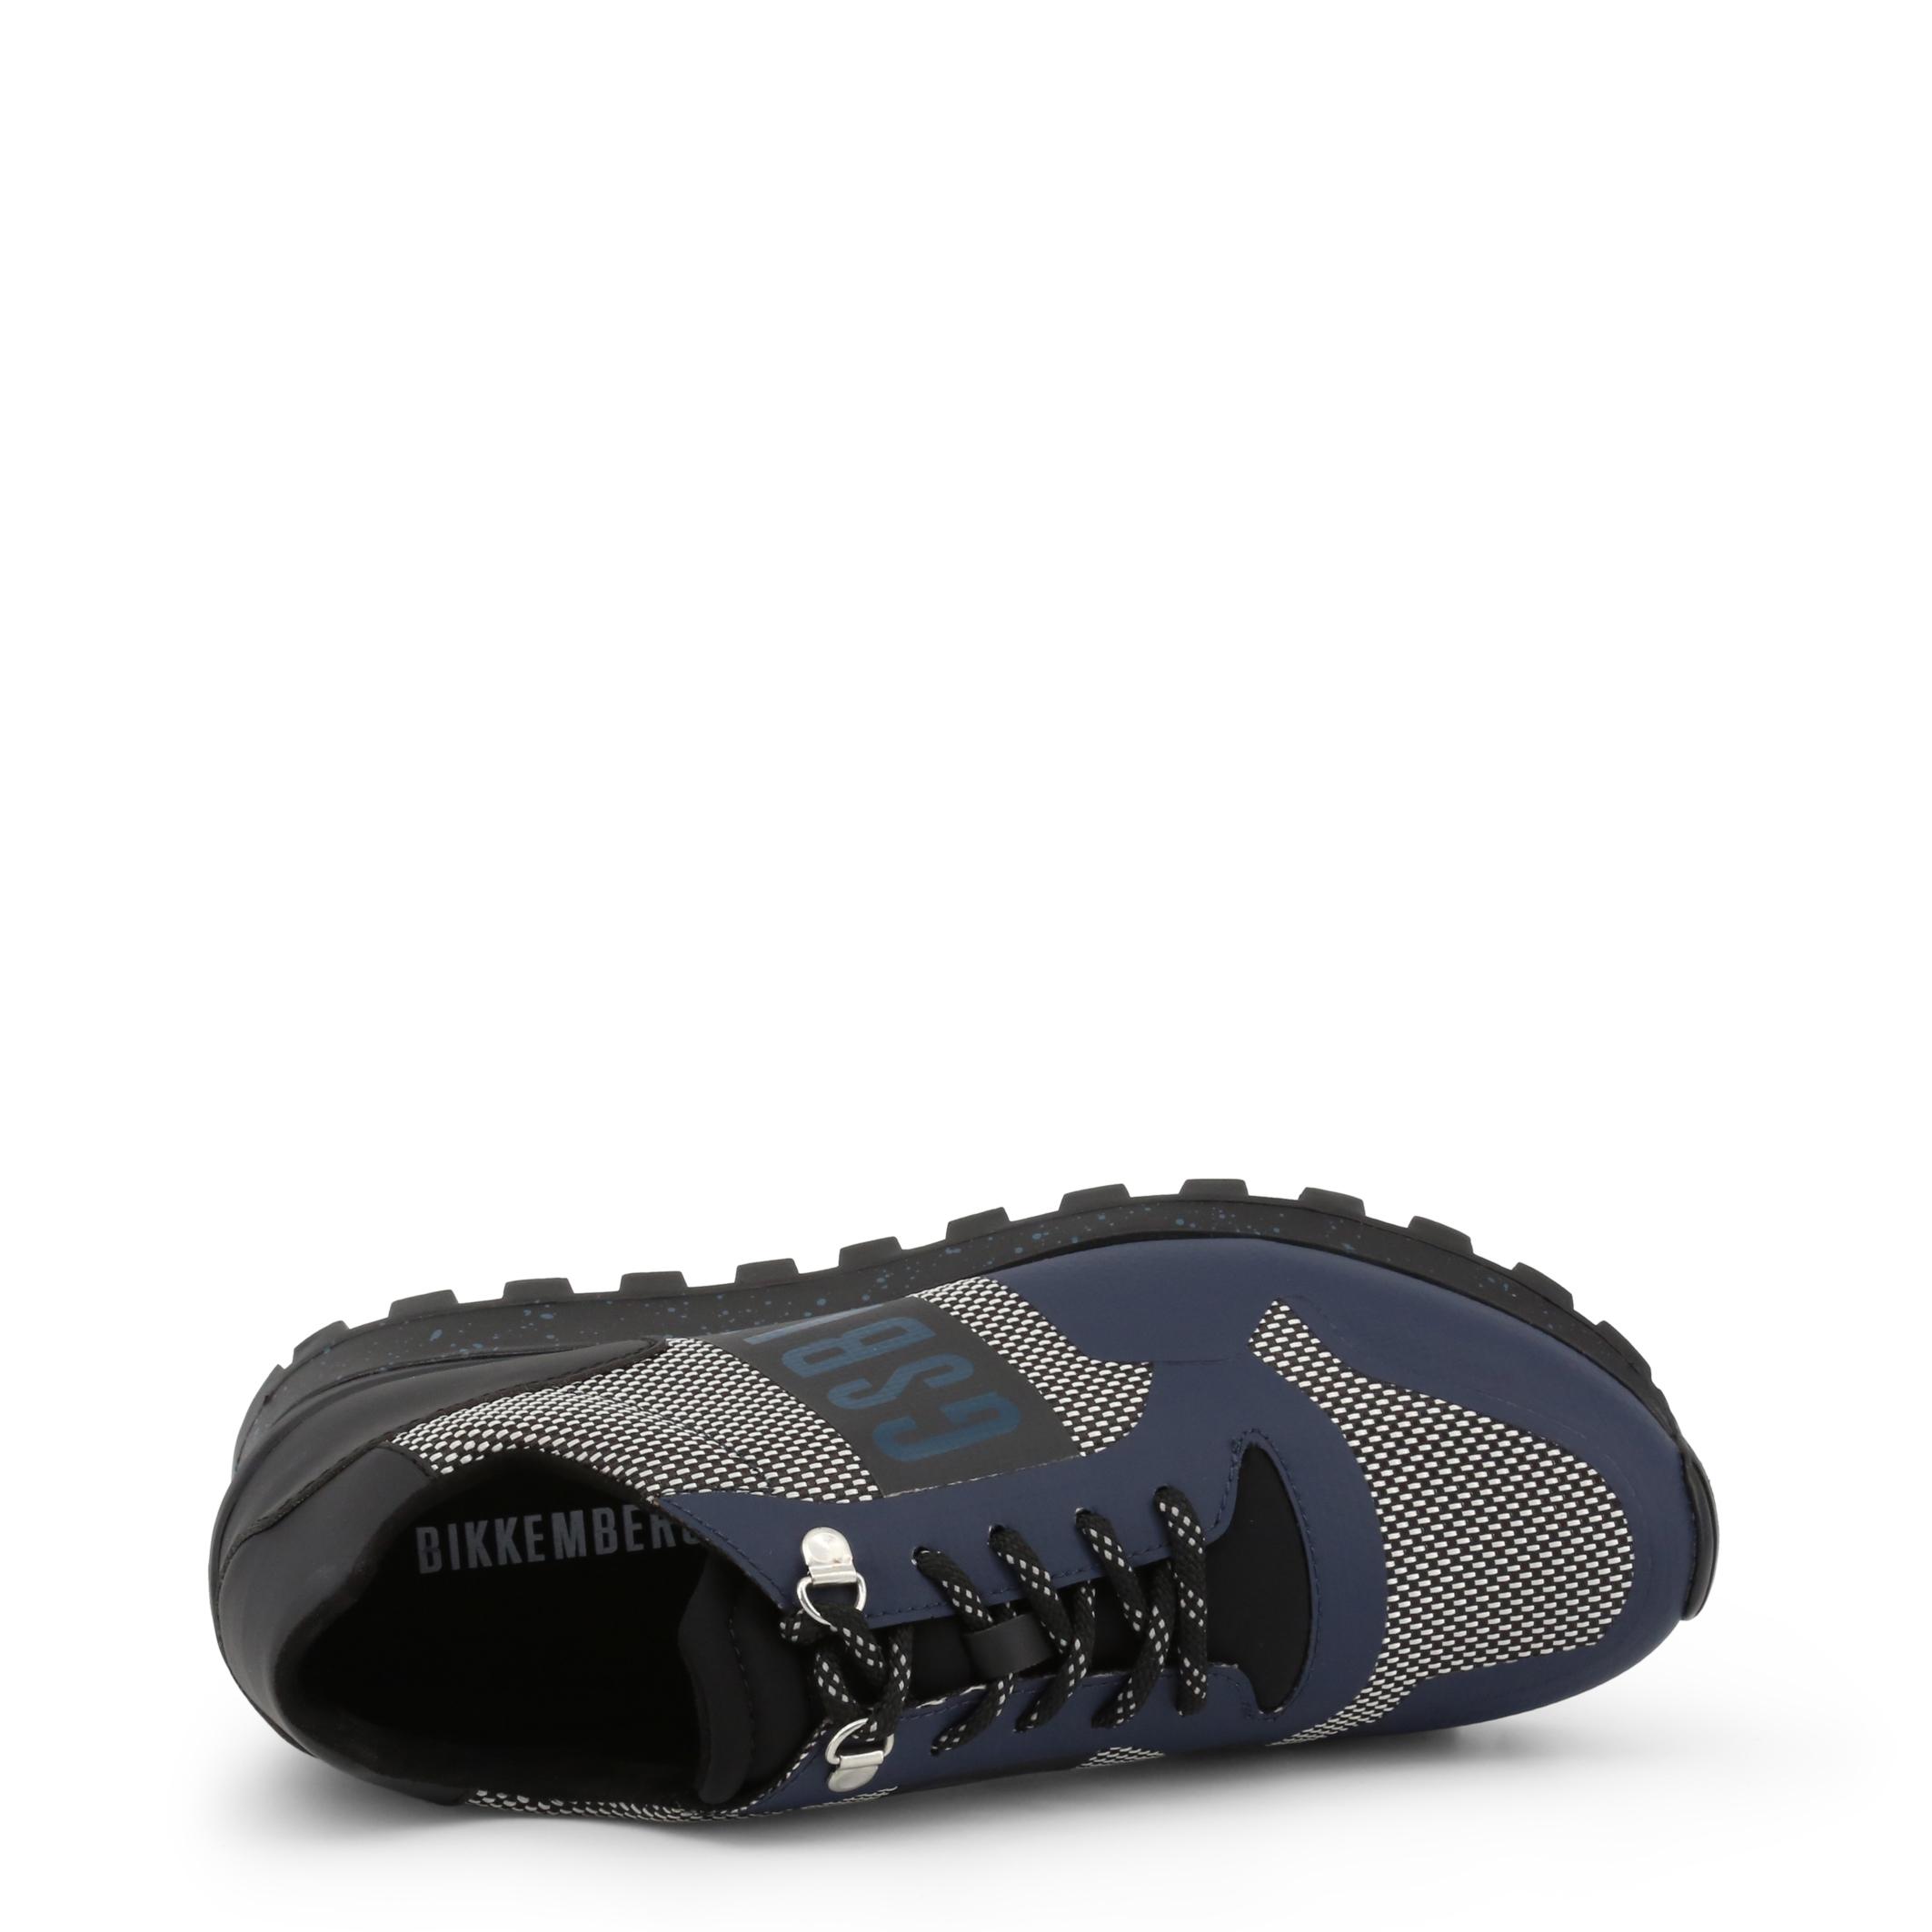 Sneakers-Bikkembergs-FEND-ER-2217-Uomo-Blu-101350 miniatura 3